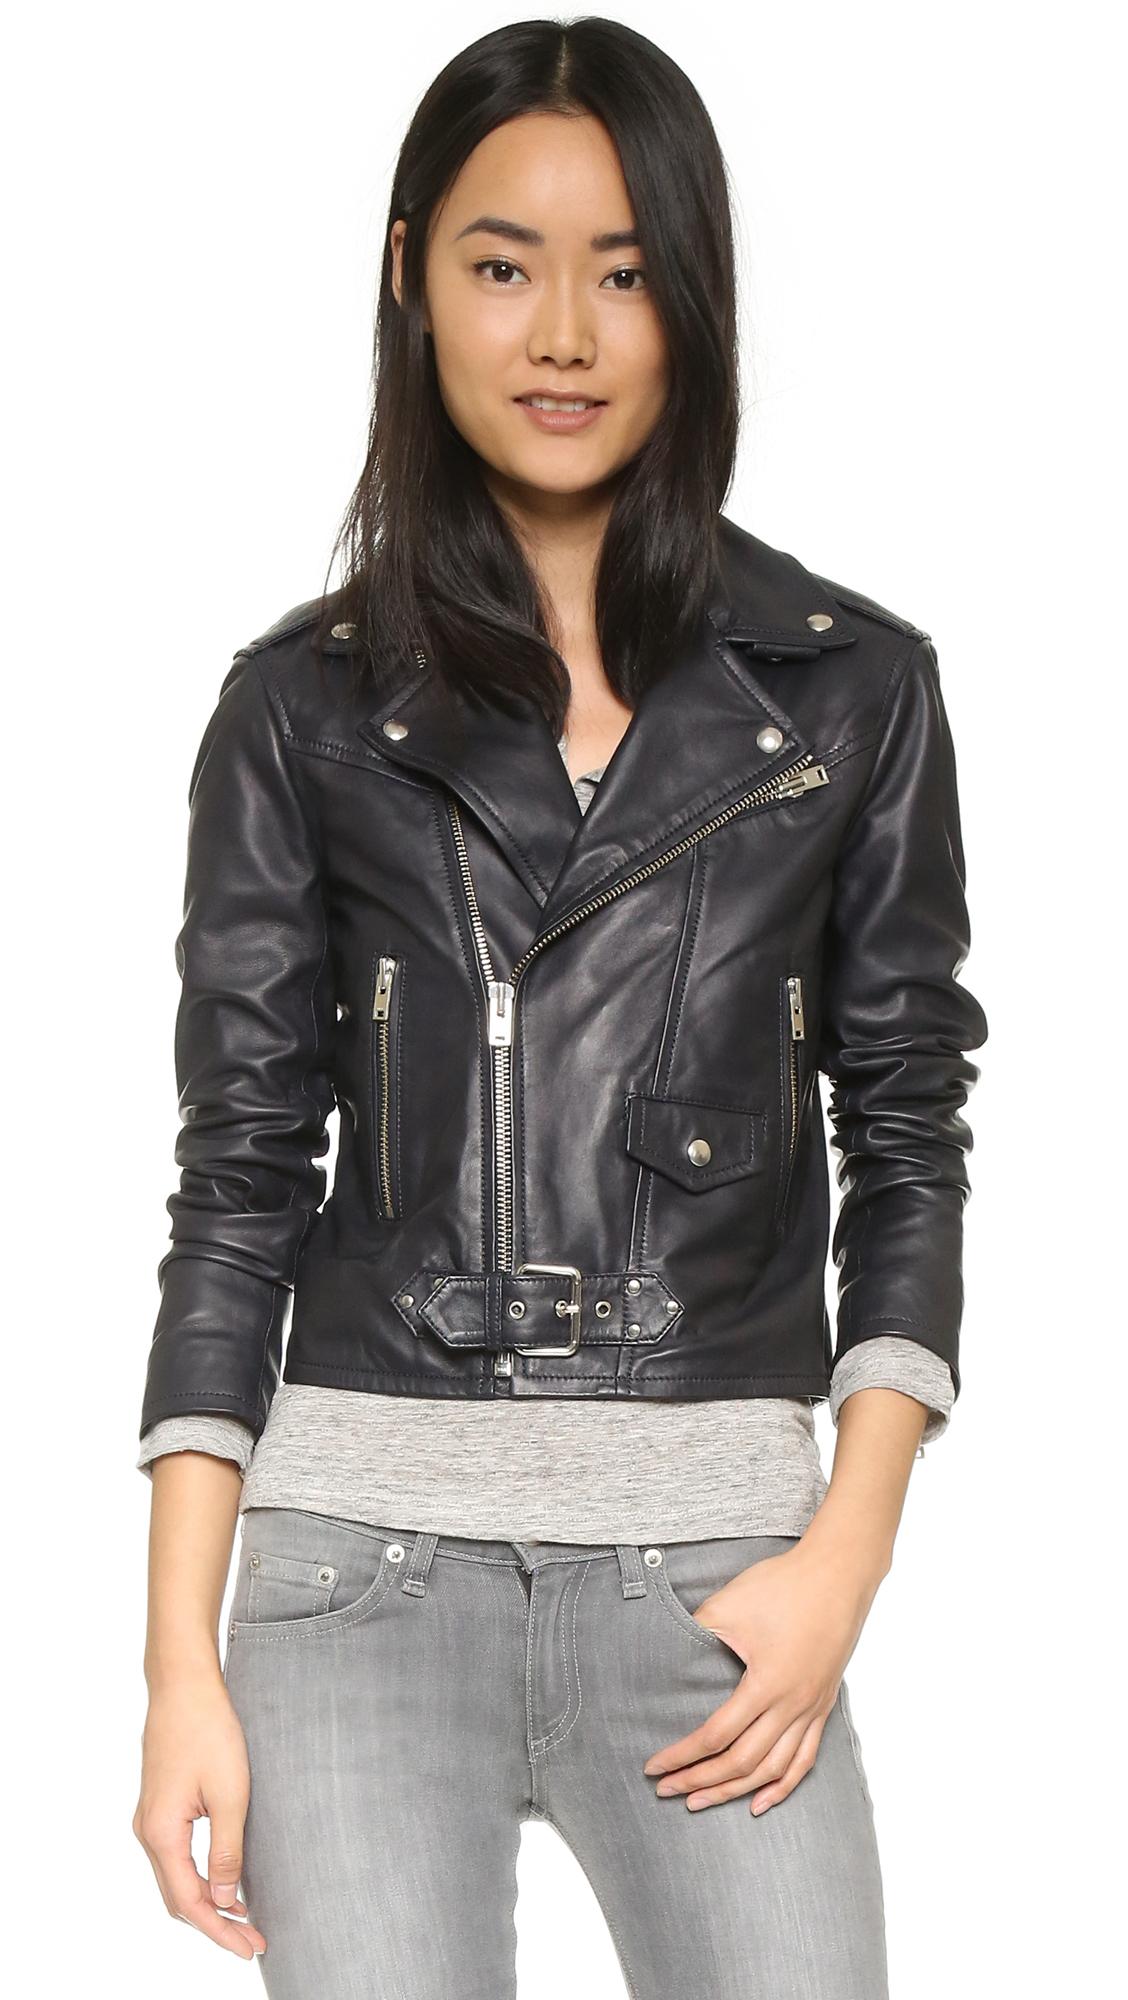 Leather Jackets- IRO? - PurseForum - forum.purseblog.com